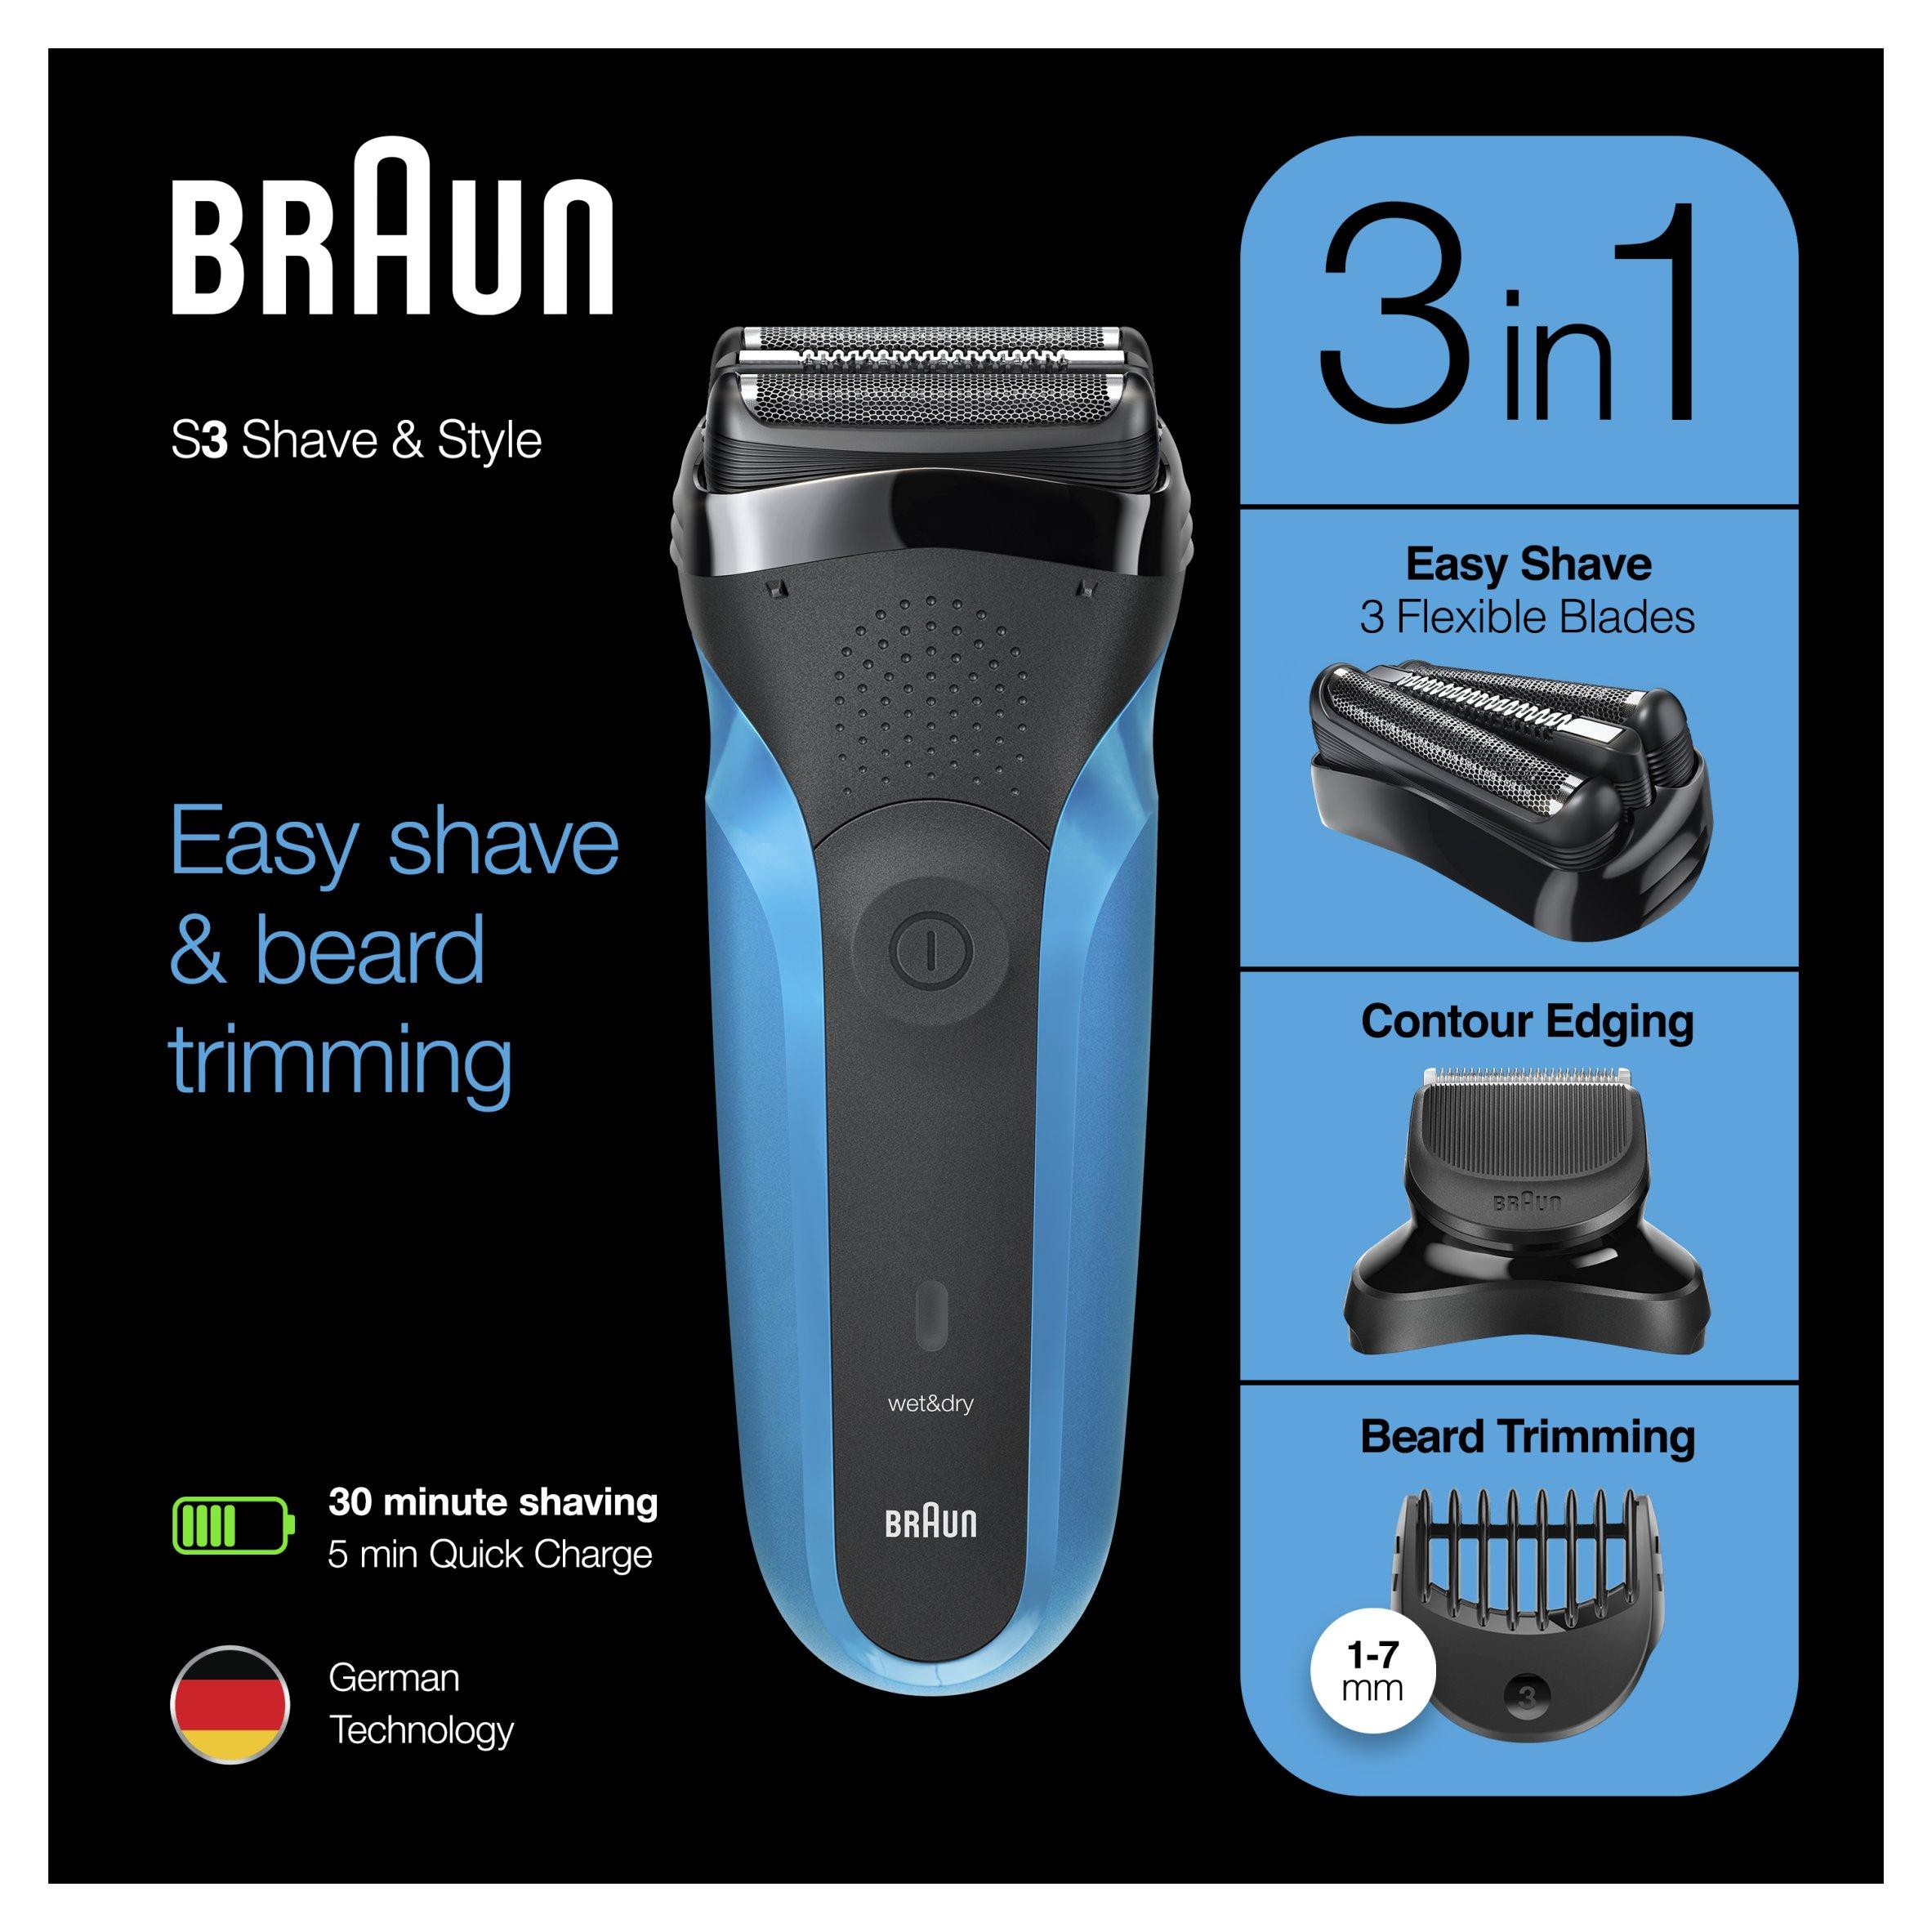 Braun Series 3 310Bt Shaver And Styler